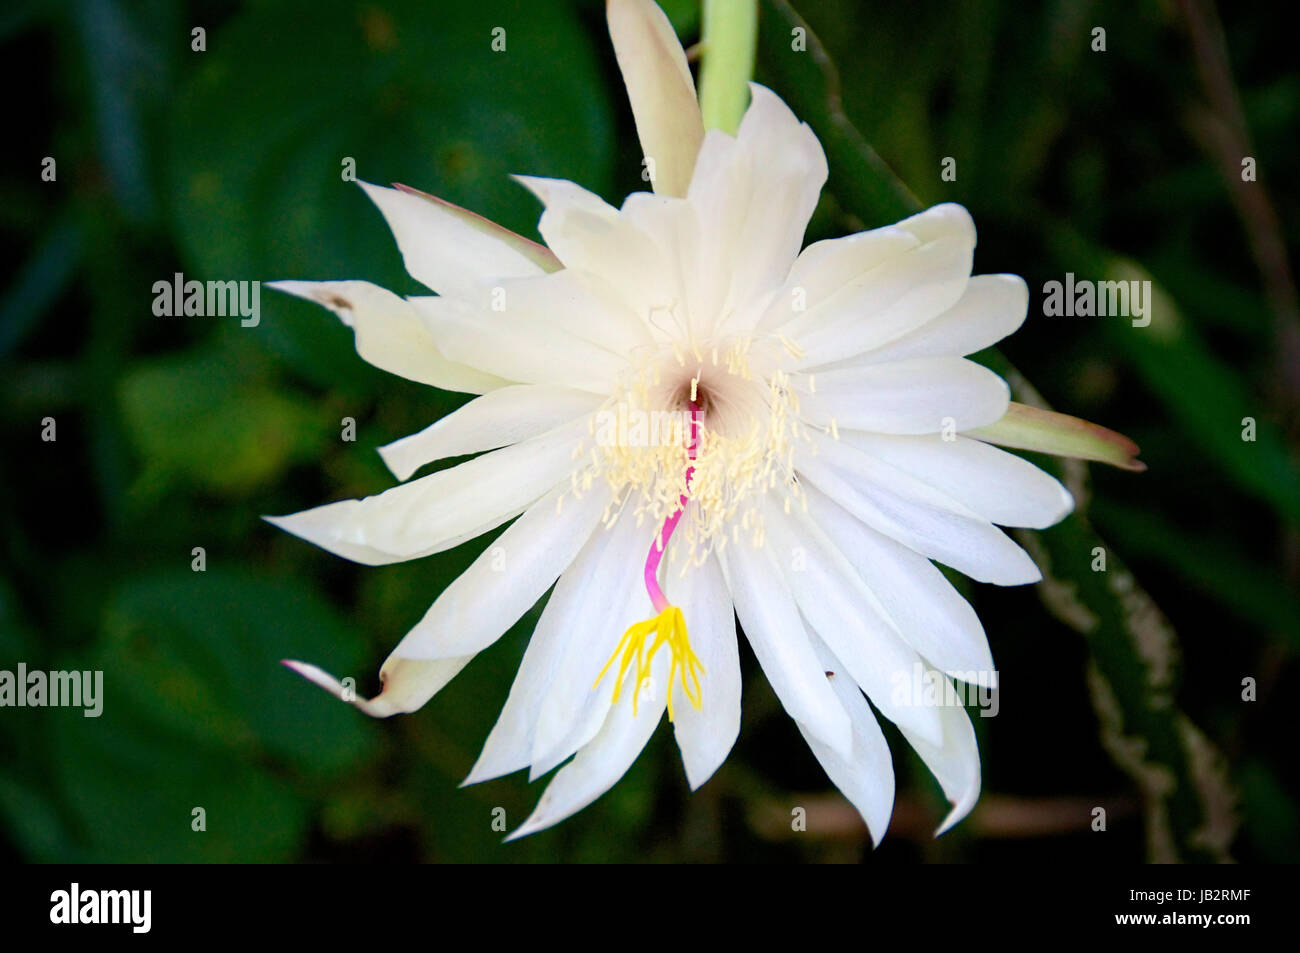 Night blooming cereus cactus in bloom showing large white flower night blooming cereus cactus in bloom showing large white flower mightylinksfo